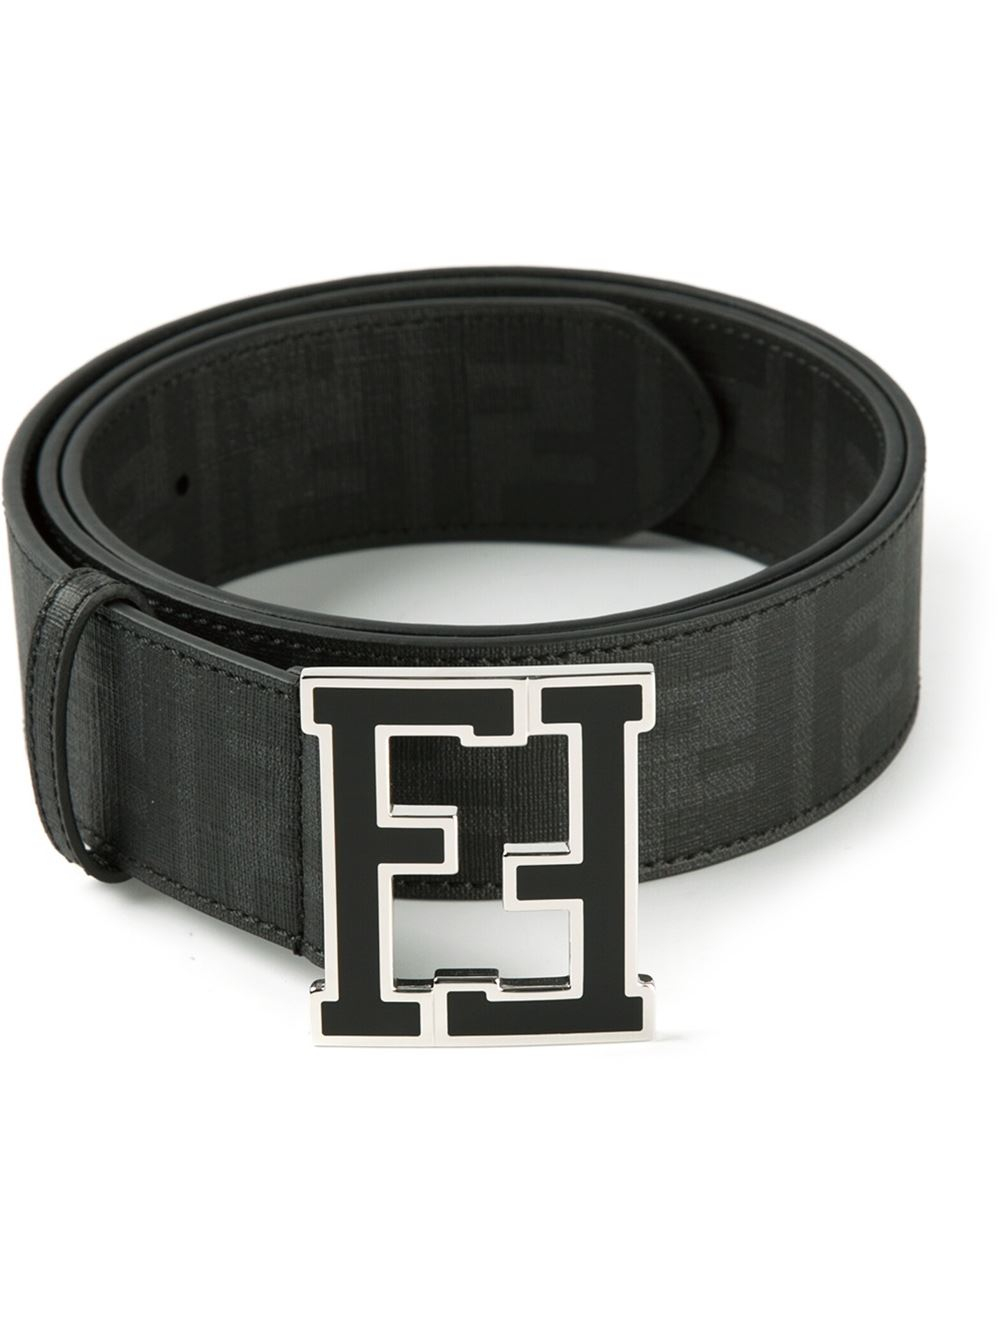 Black Fendi Belt